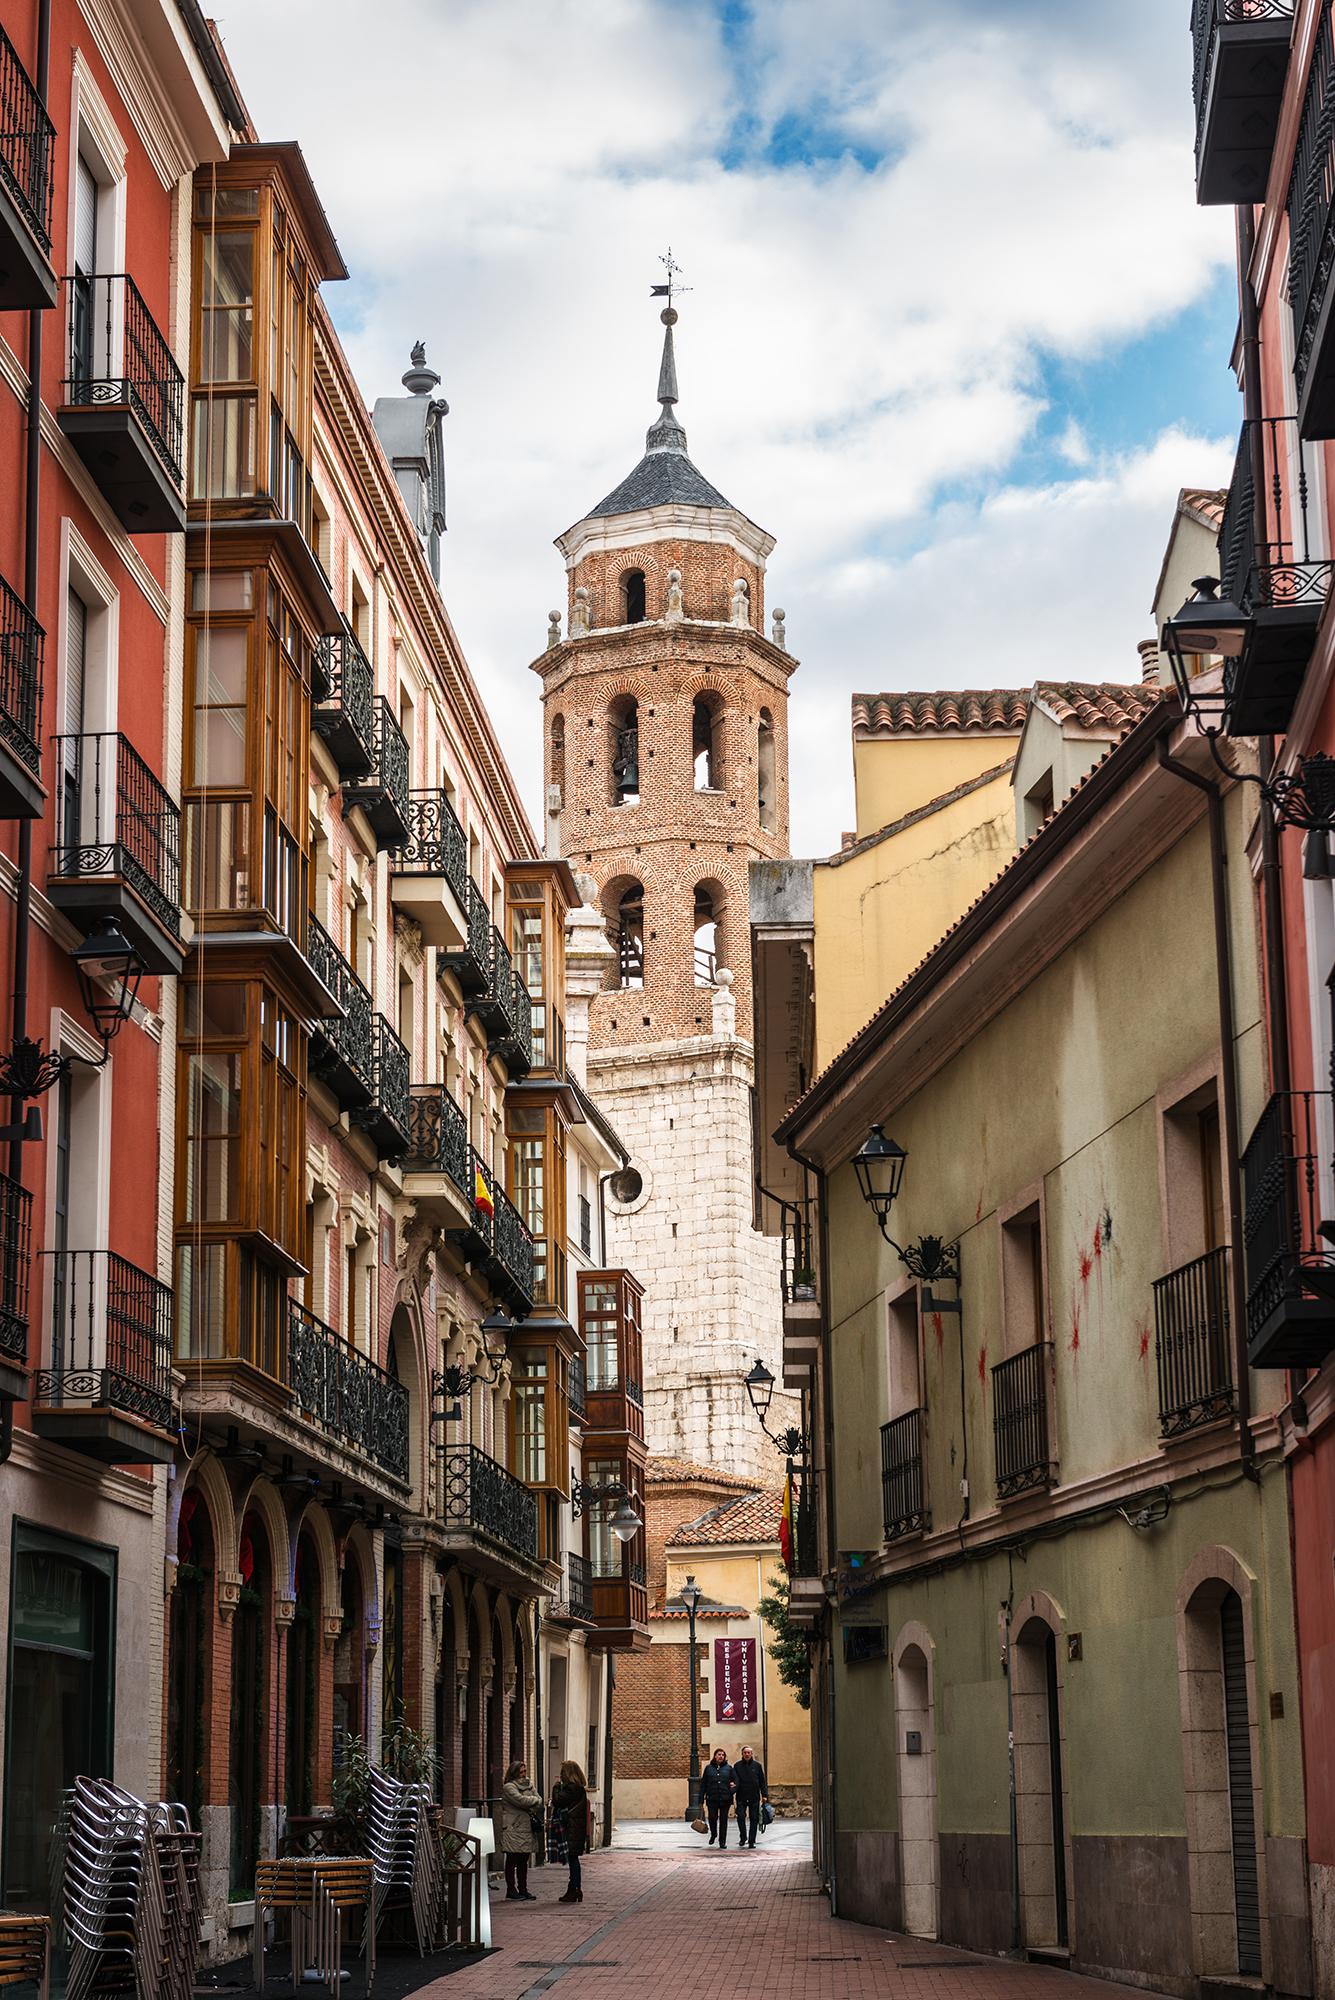 Narrow street in Valladolid's city center